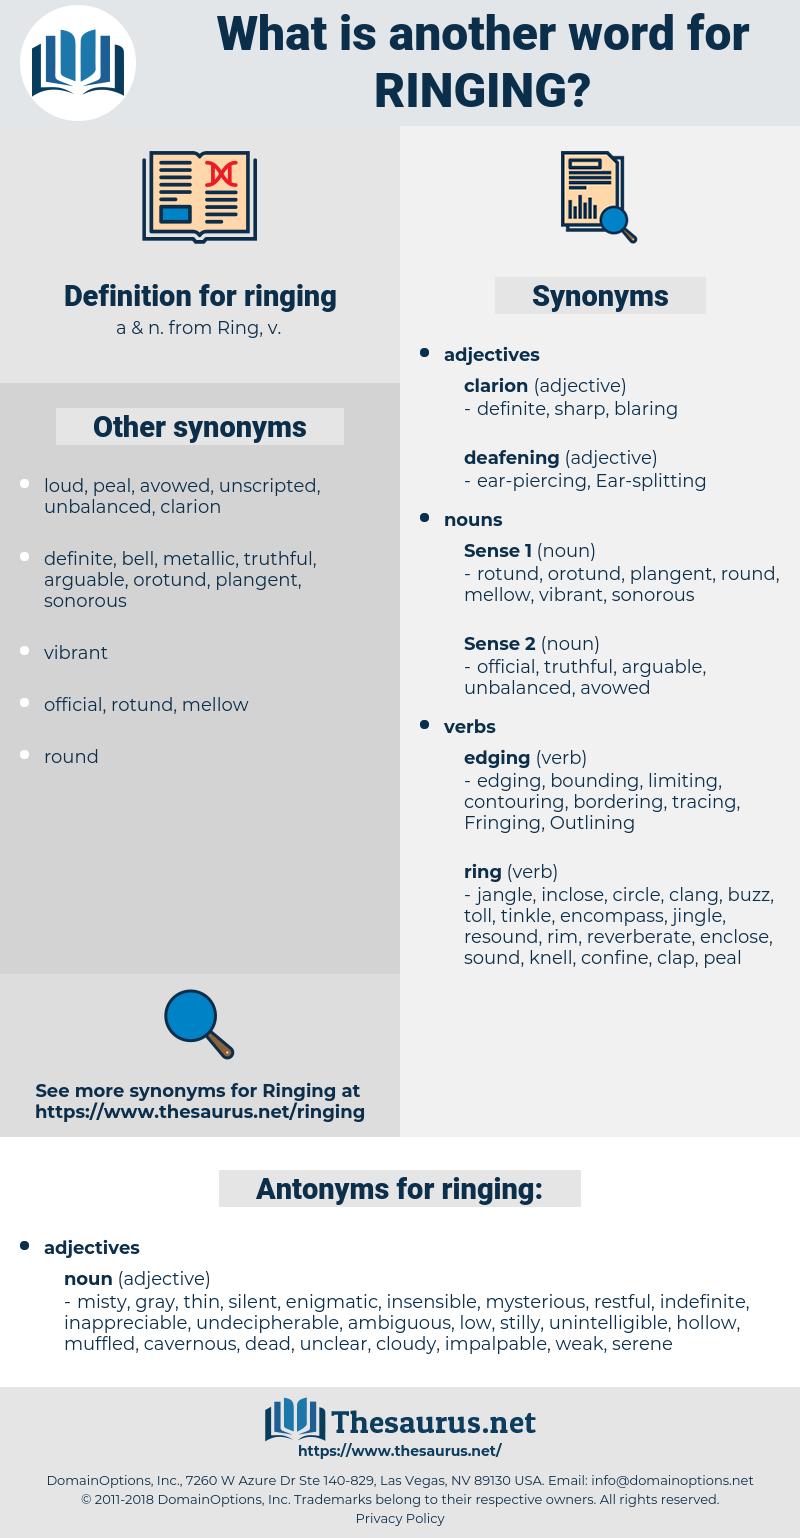 ringing, synonym ringing, another word for ringing, words like ringing, thesaurus ringing